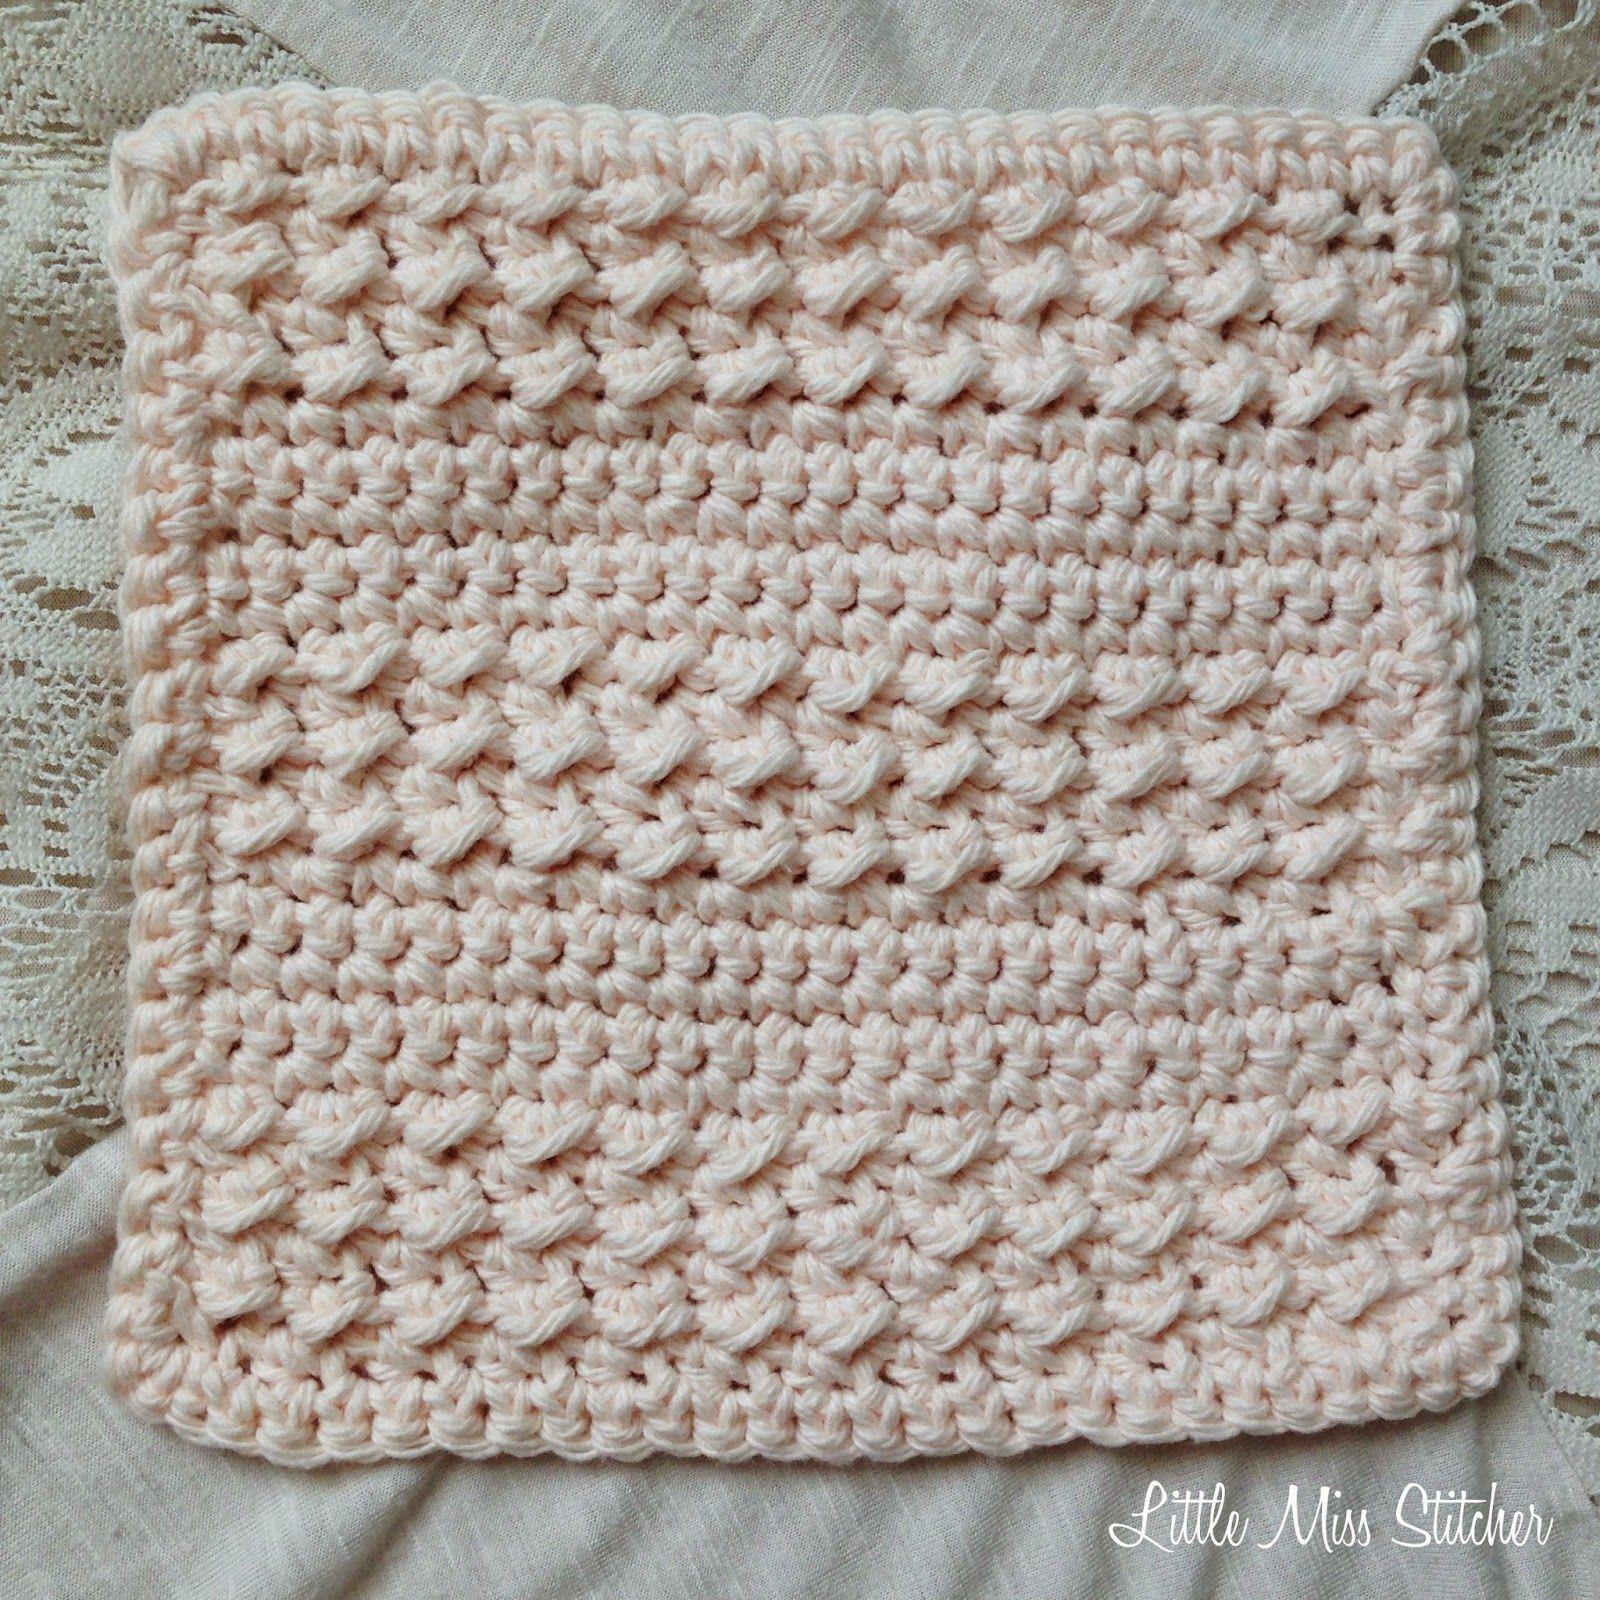 Little miss stitcher 5 free crochet dishcloth patterns crochet little miss stitcher 5 free crochet dishcloth patterns bankloansurffo Gallery